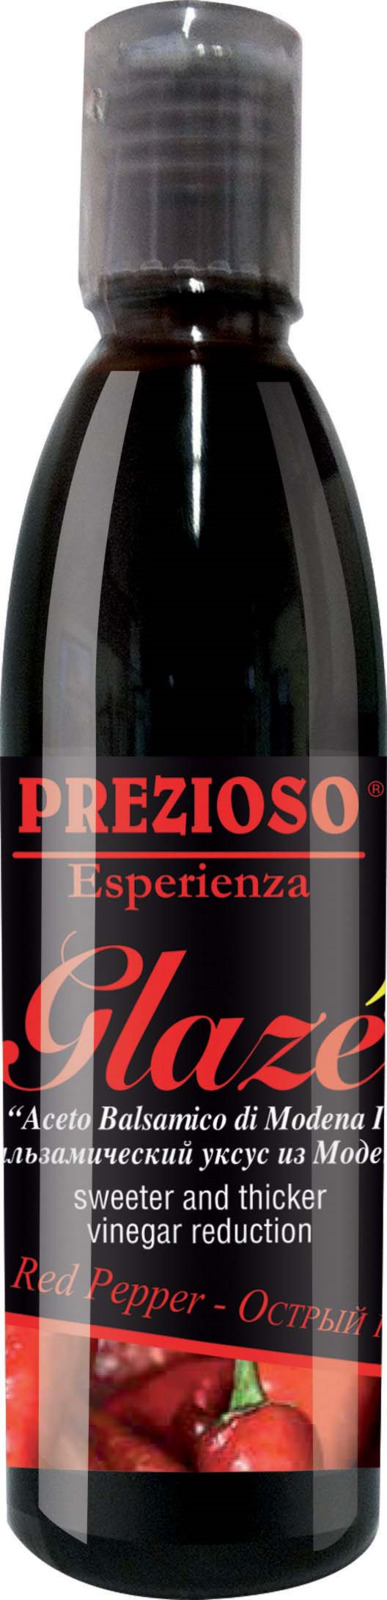 Глазурь Prezioso Esperienza, на основе бальзамического уксуса из Модены, с ароматом острого перца, 250 г ponti топпинг соевый glassa alla soia на основе бальзамического уксуса di modena 250 мл